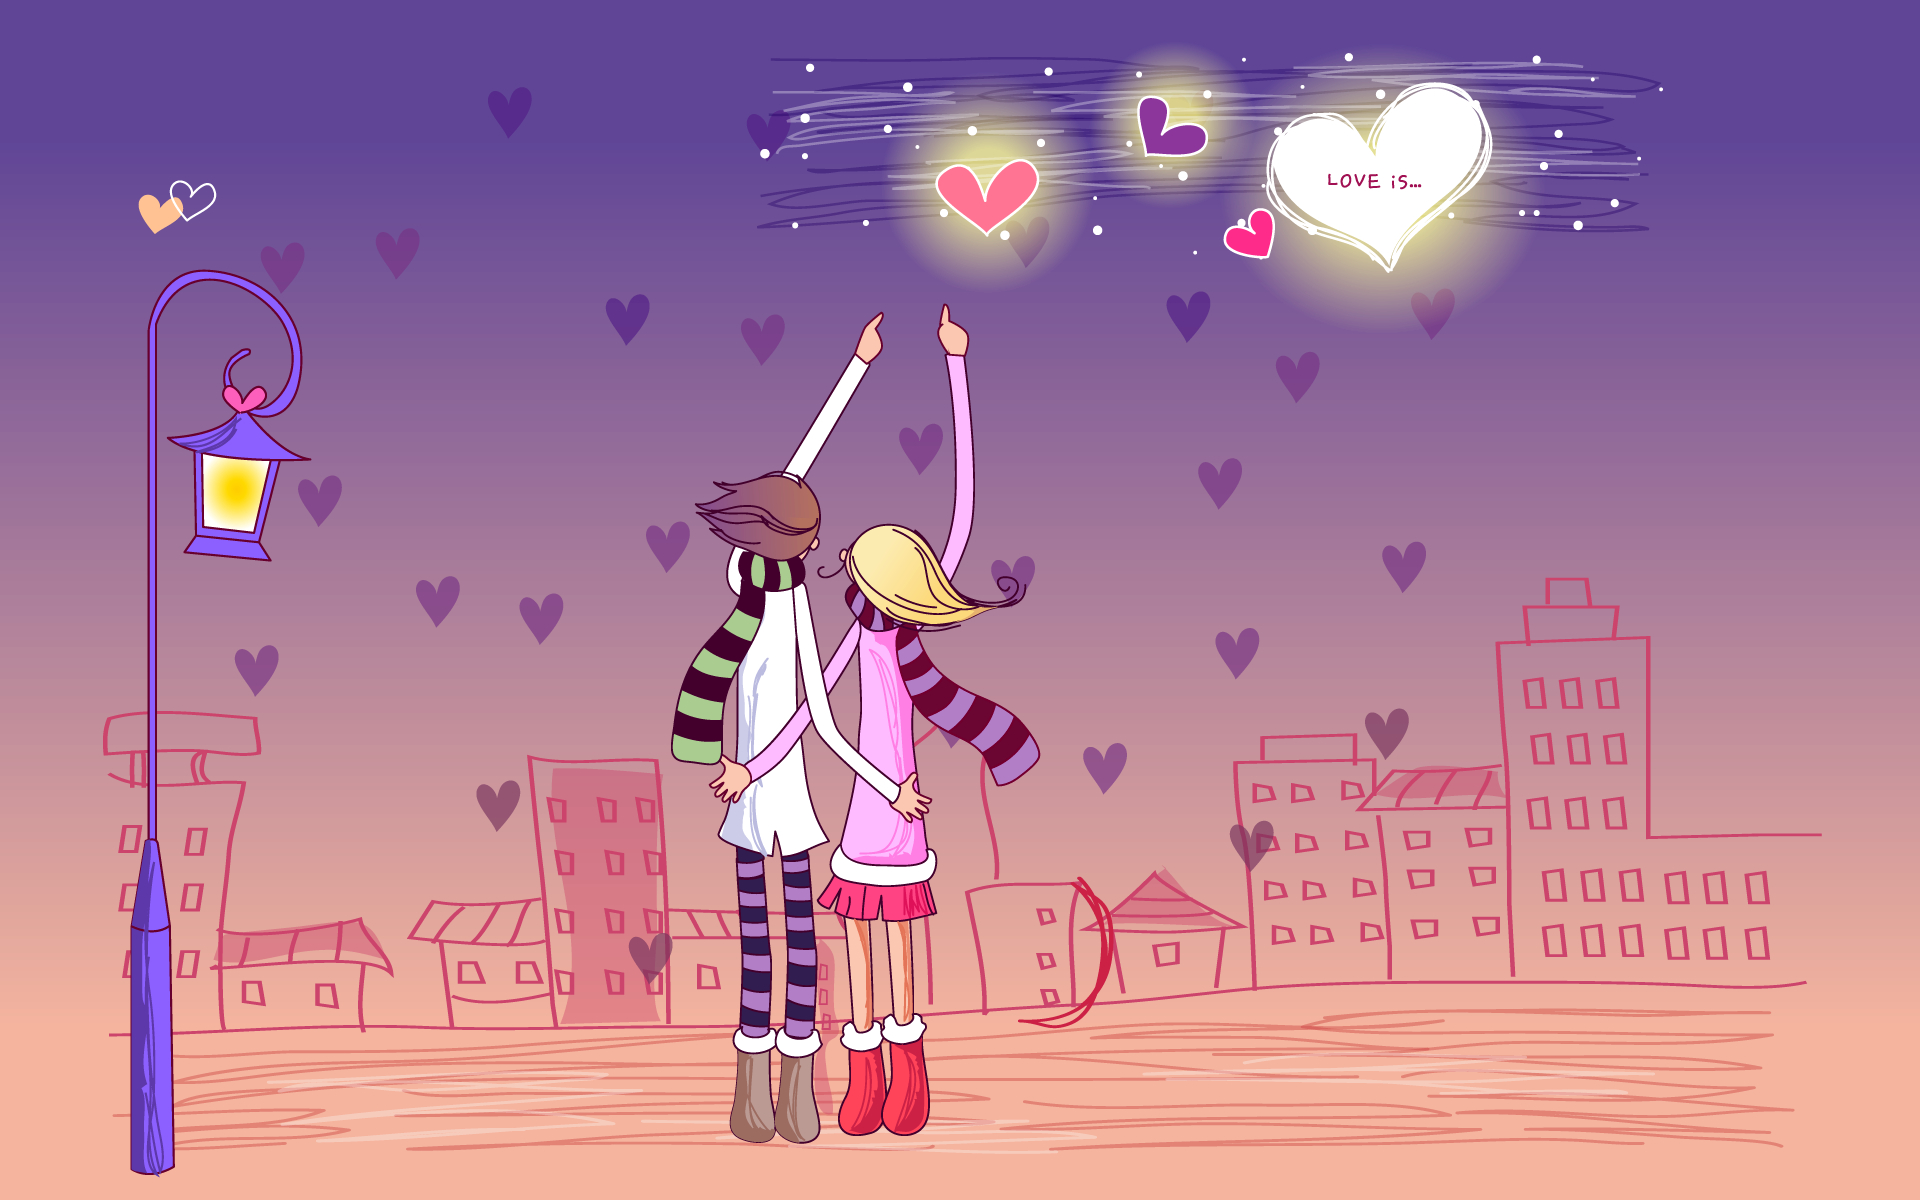 Wallpaper Download Cute Couple Valentine S Day Wallpapers Hd Pixelstalk Net